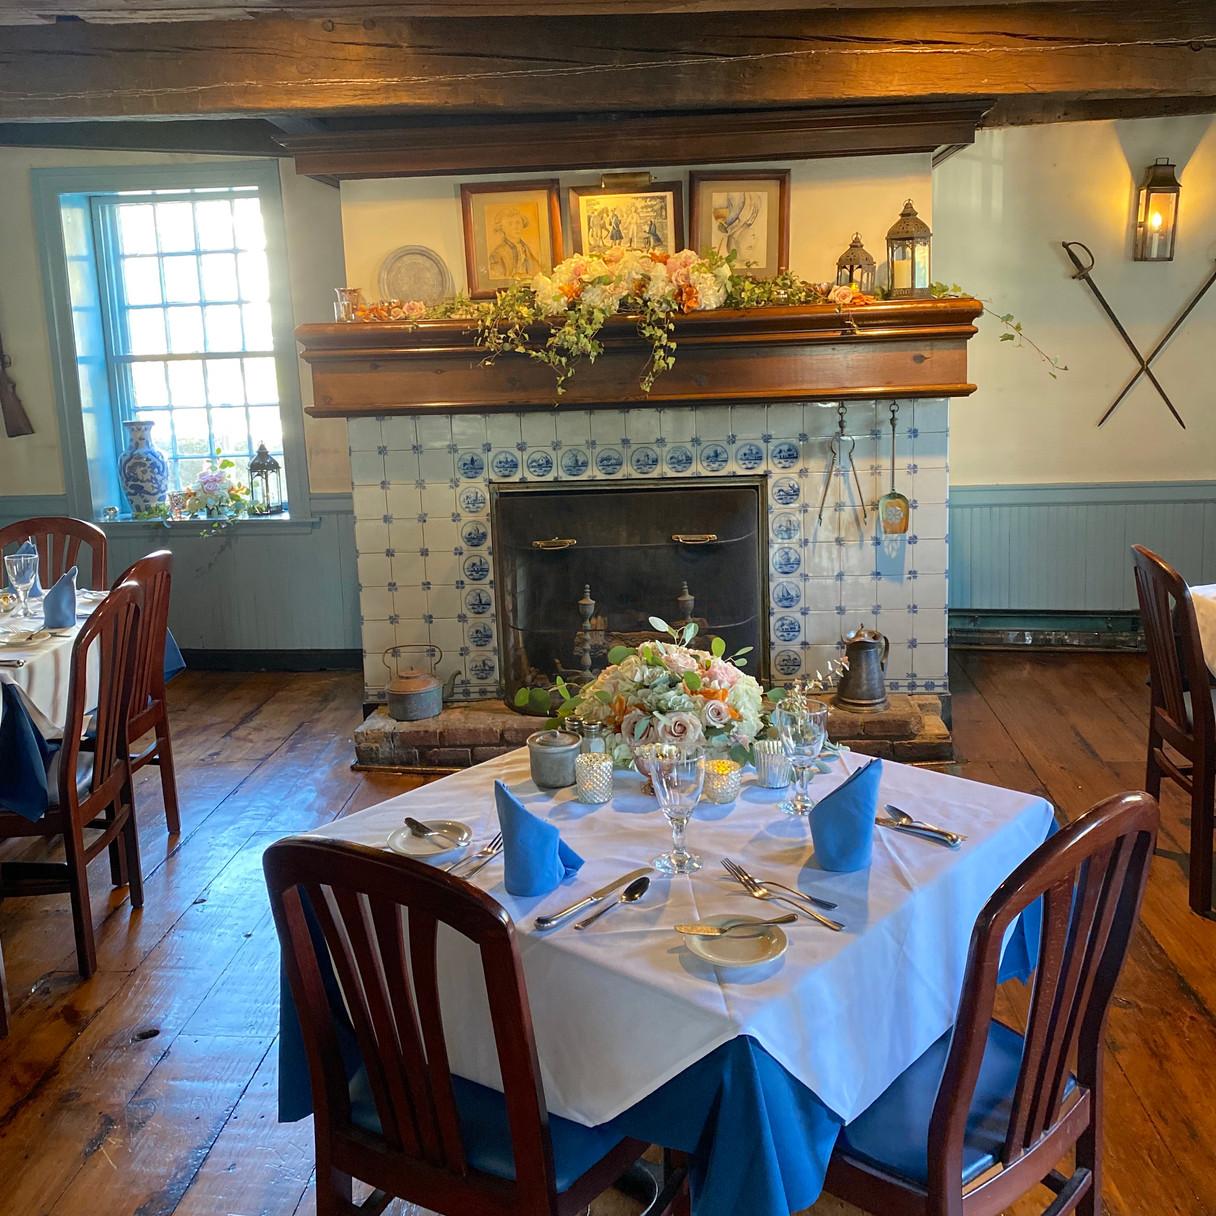 Rehersal Dinner Flowers Table & Mantle -